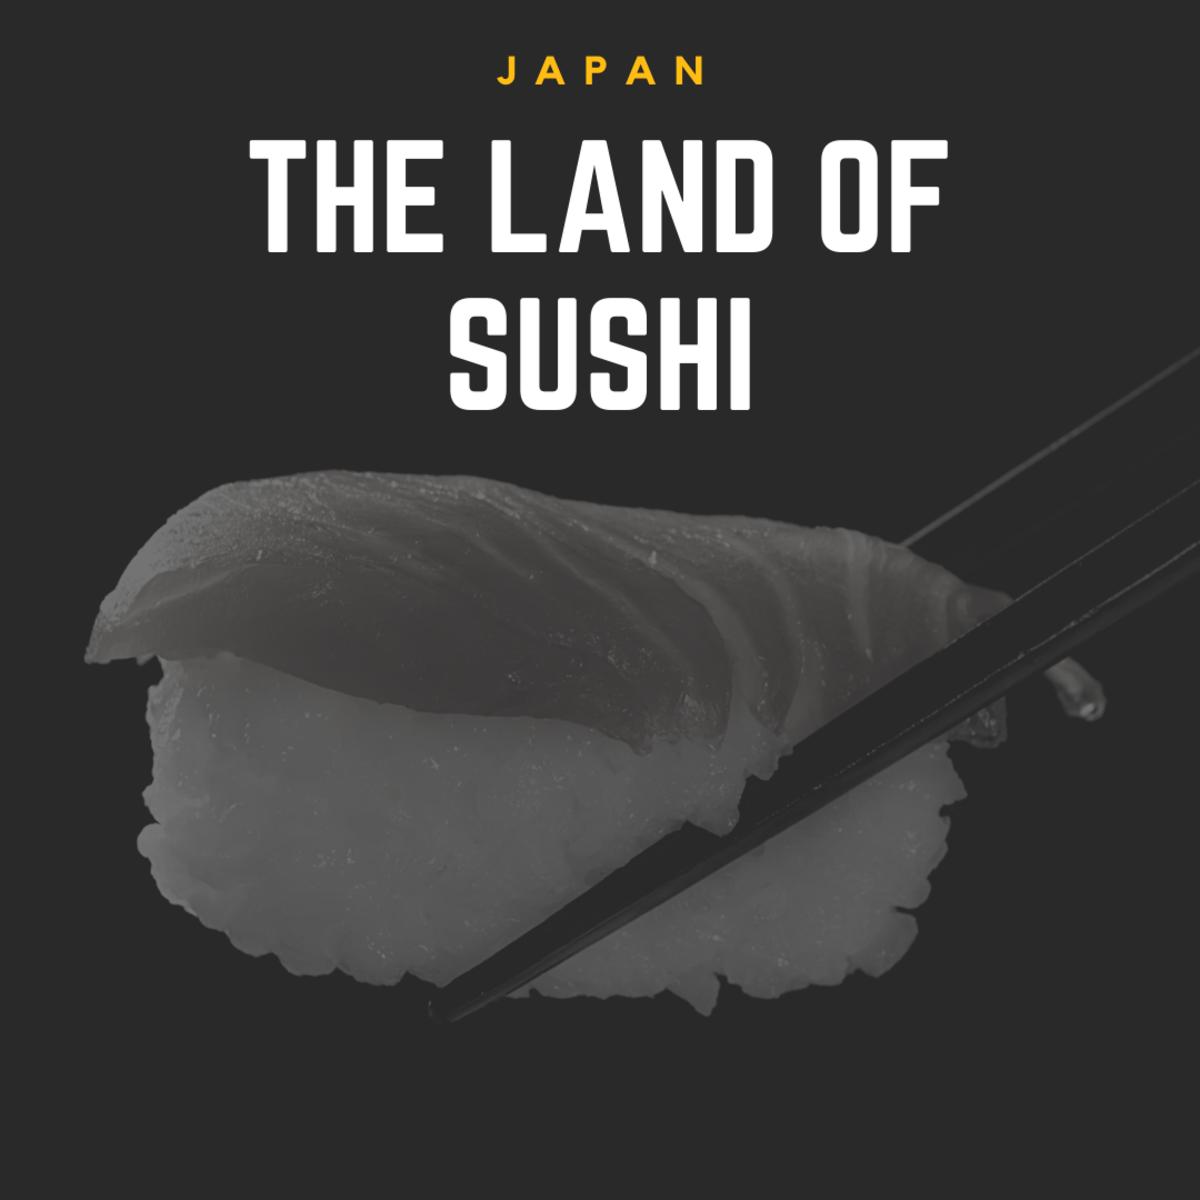 Japan: The Land of Sushi